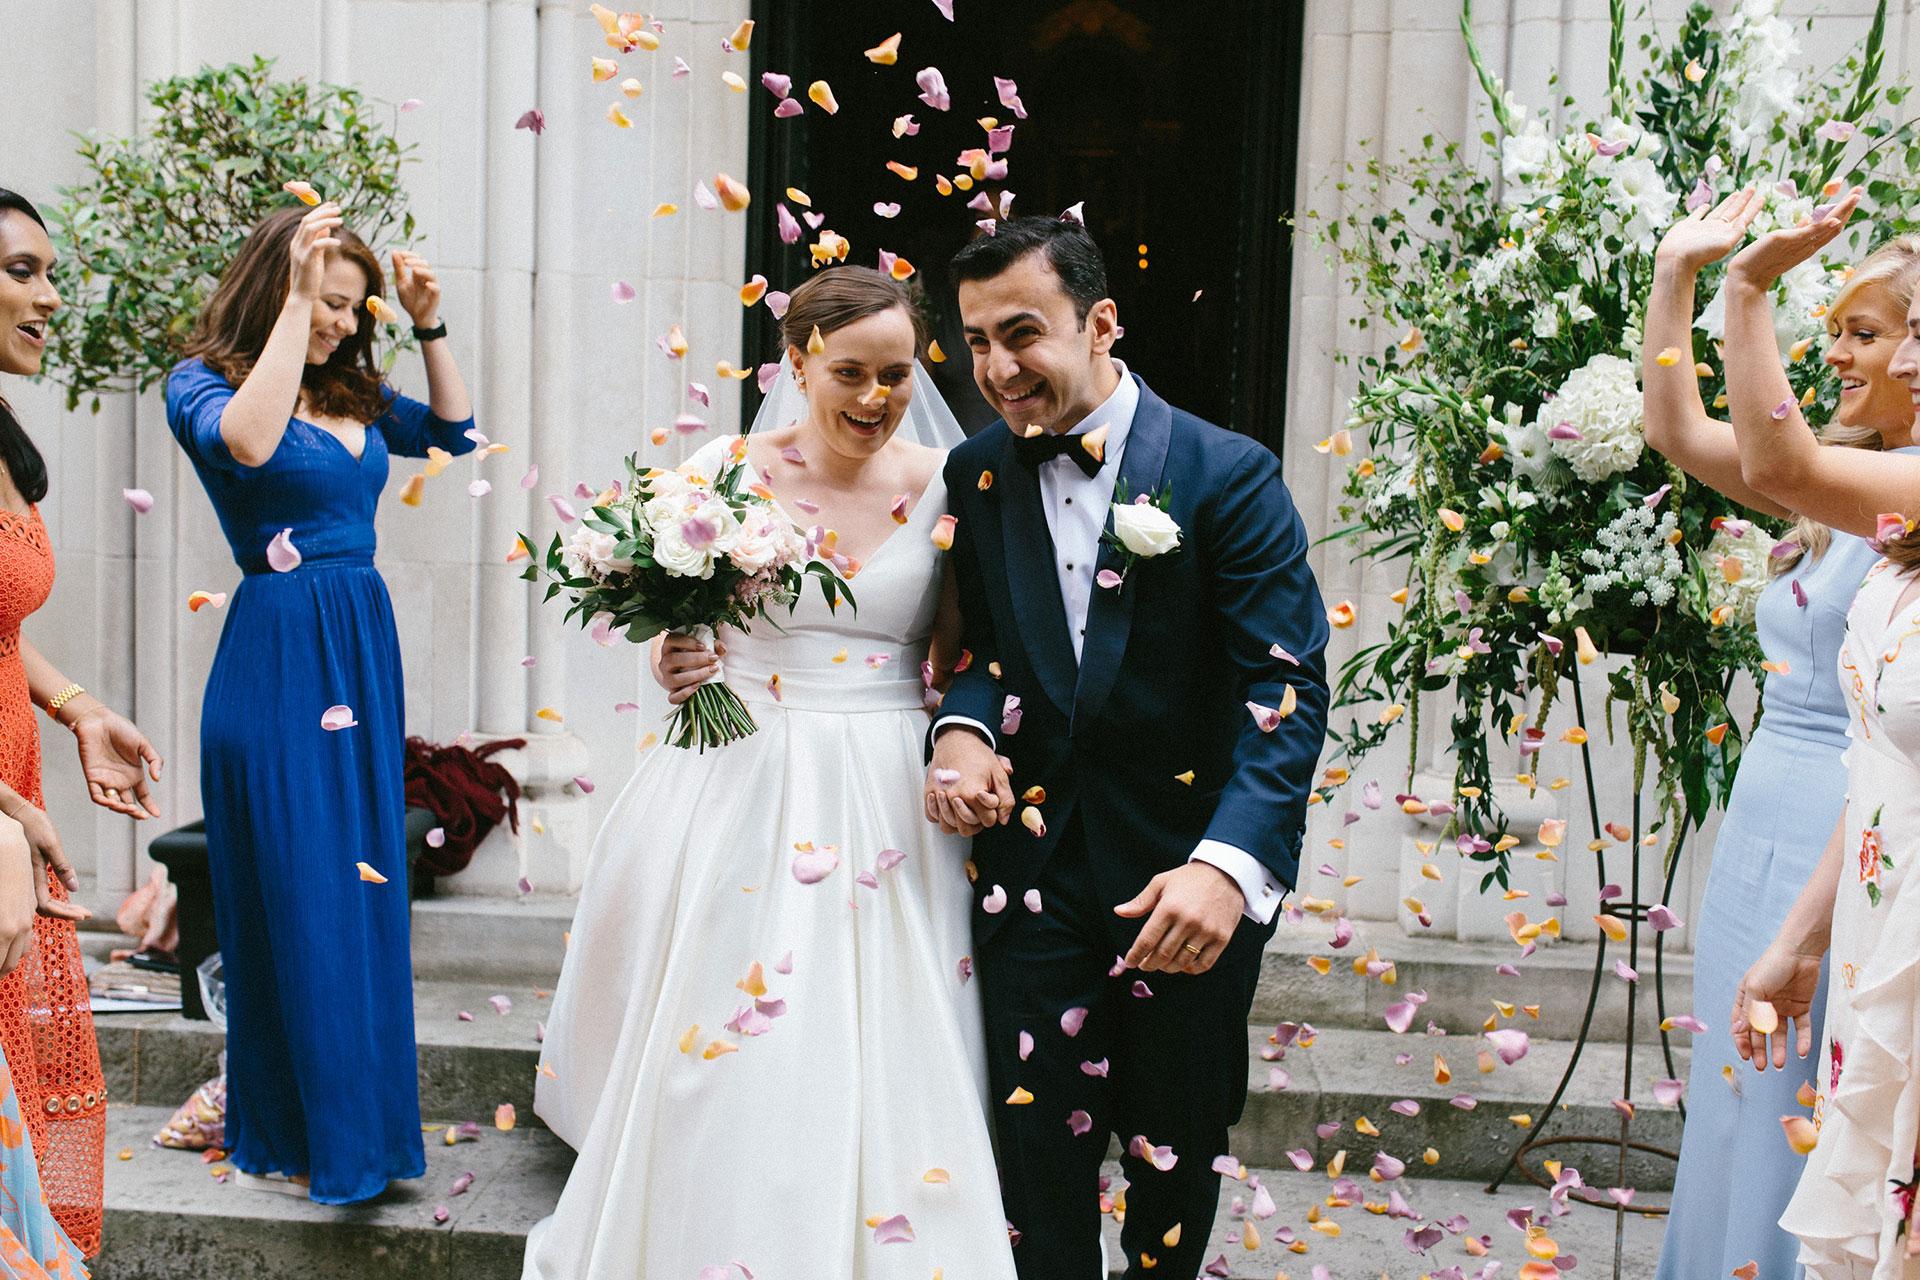 Syon-Park-Wedding-Photographer--_-Michael-Newington-Gray-197.jpg